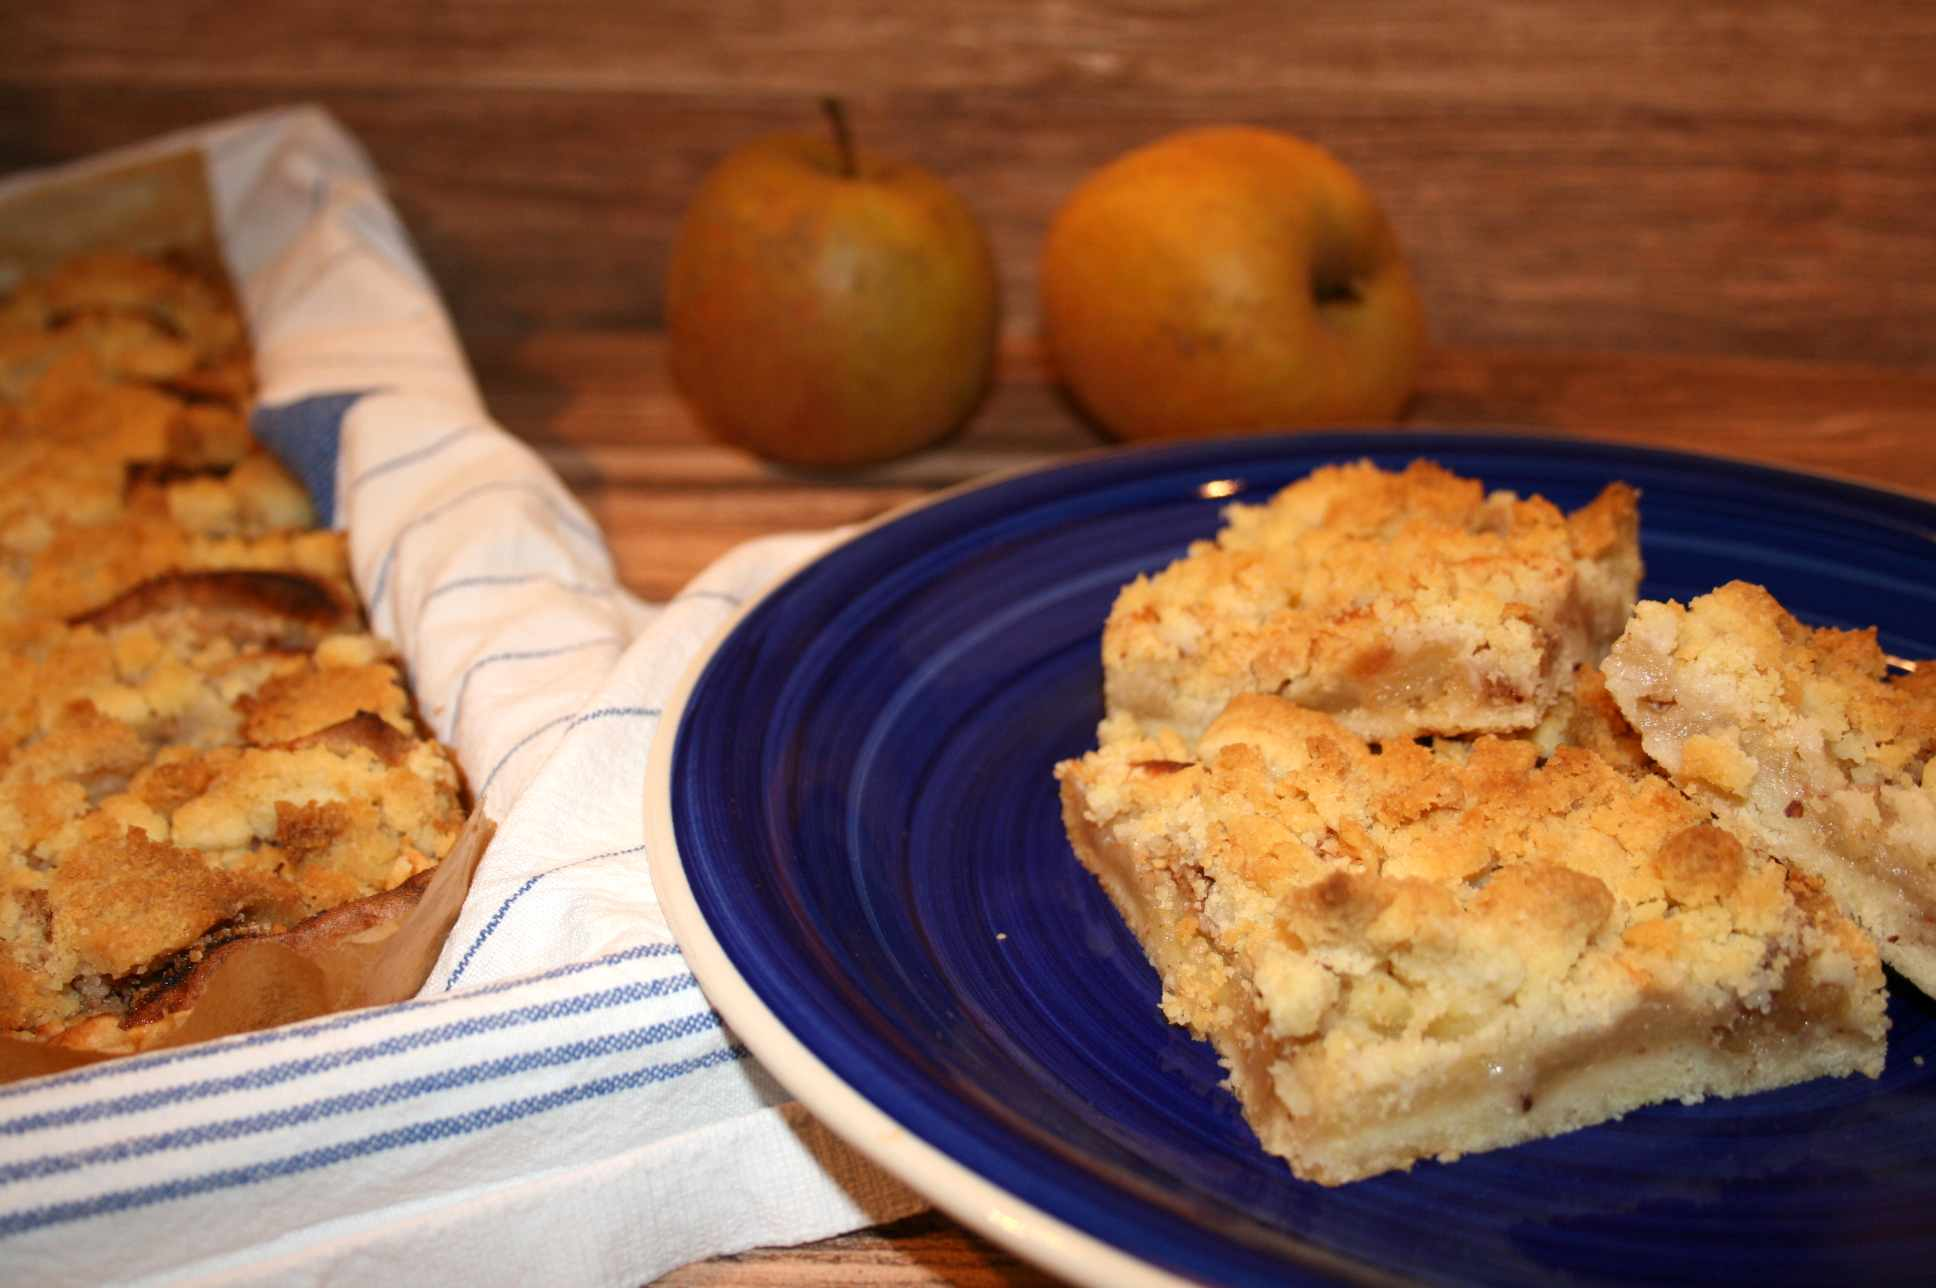 Unser Familienklassiker Apfel Streusel Kuchen